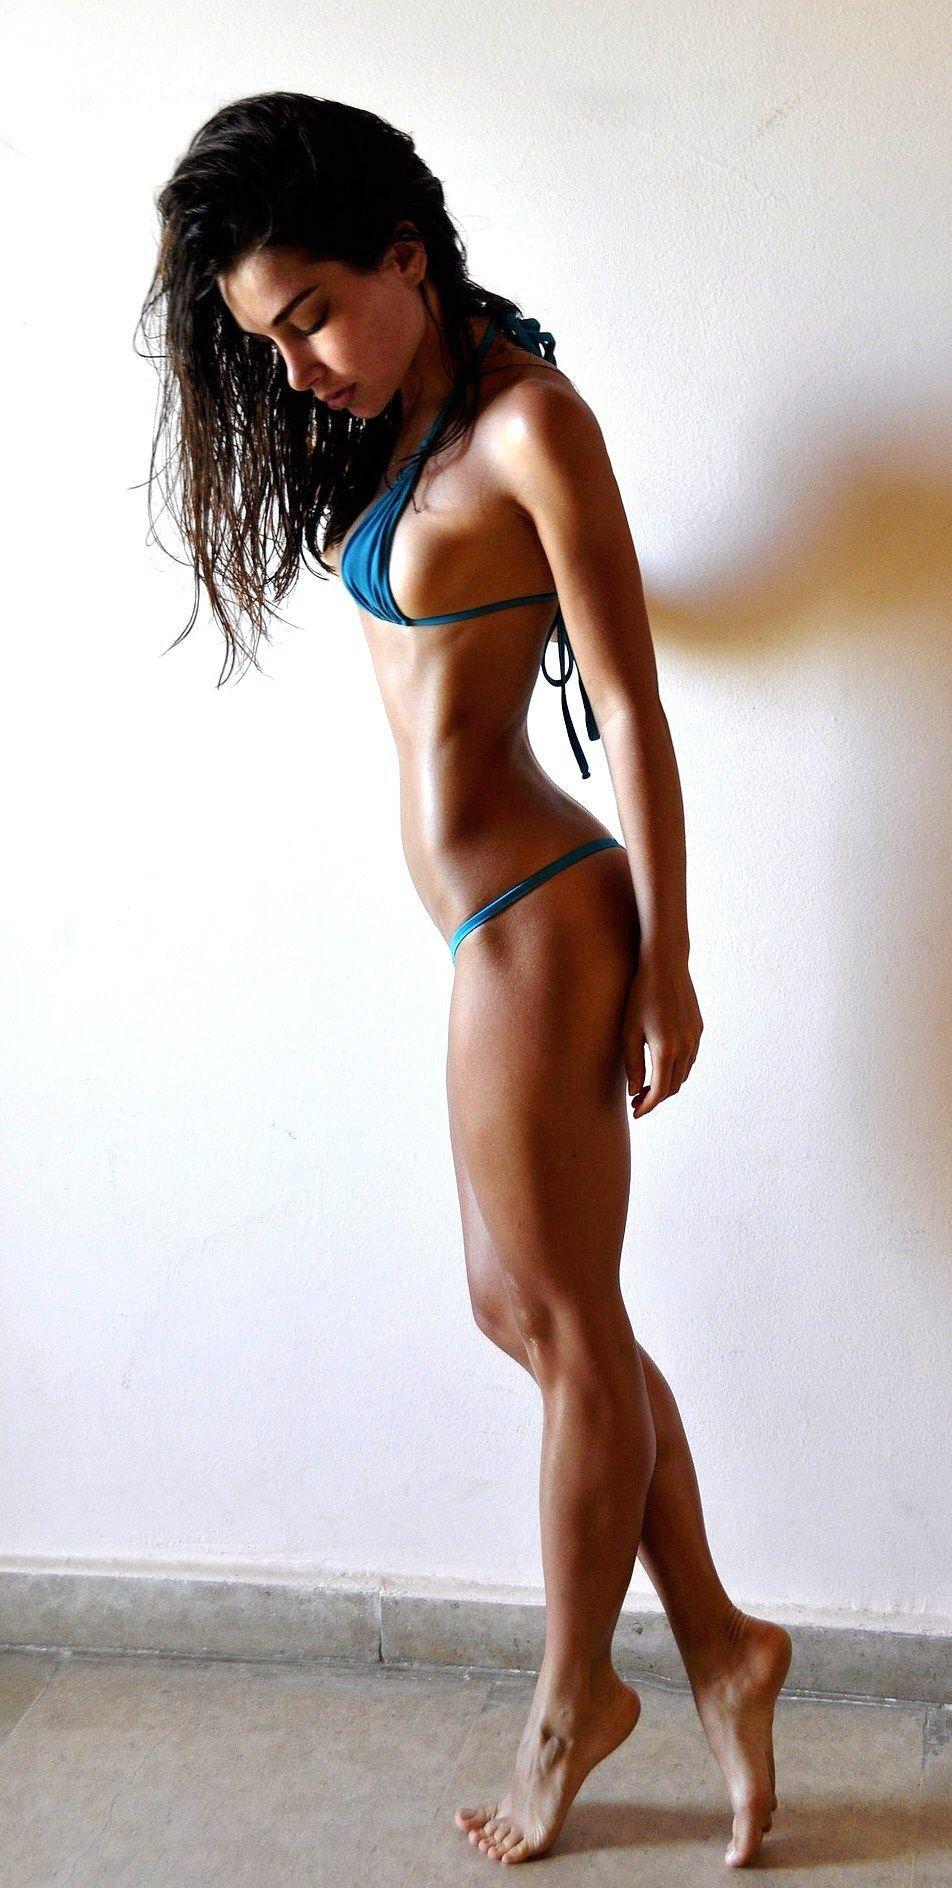 Perfectly women bikini images 71